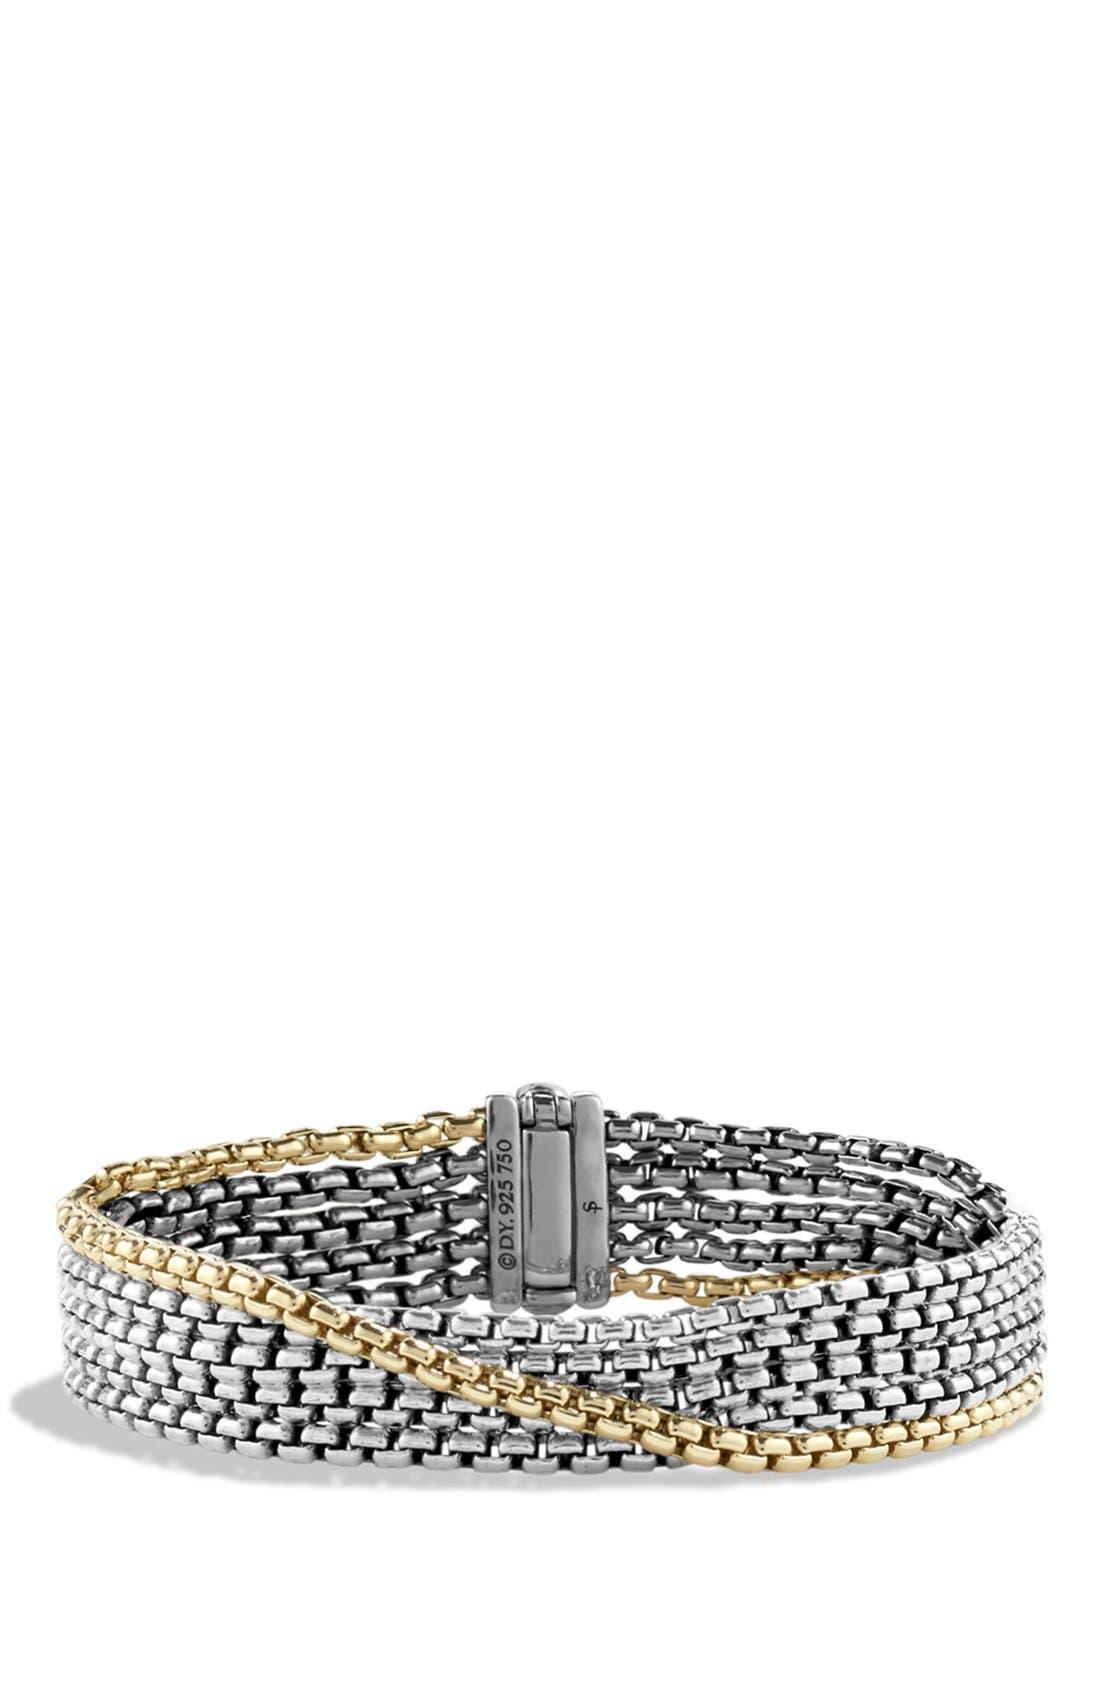 Main Image - David Yurman 'Chain' Box Chain Five-Row Bracelet with Gold